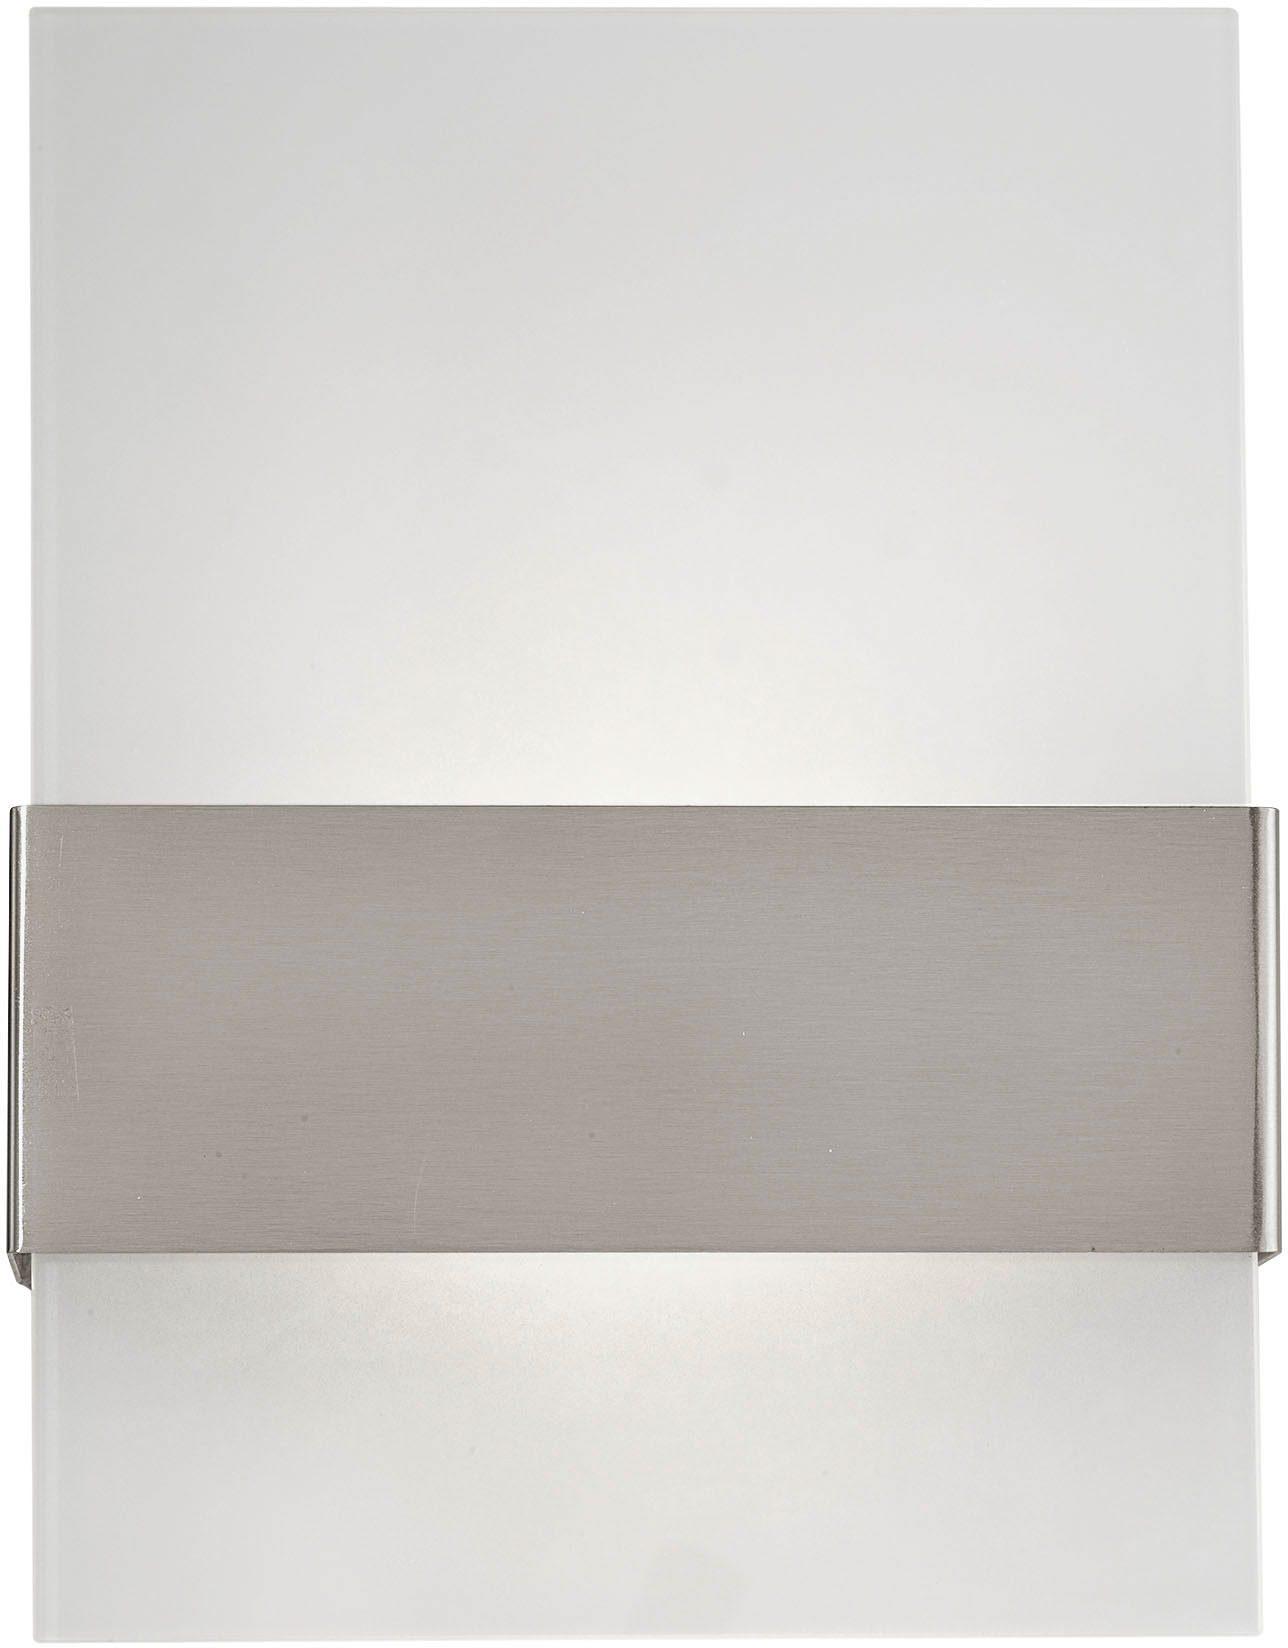 Eglo LED Außenleuchte, 2 flg., Wandleuchte, »Nadela«